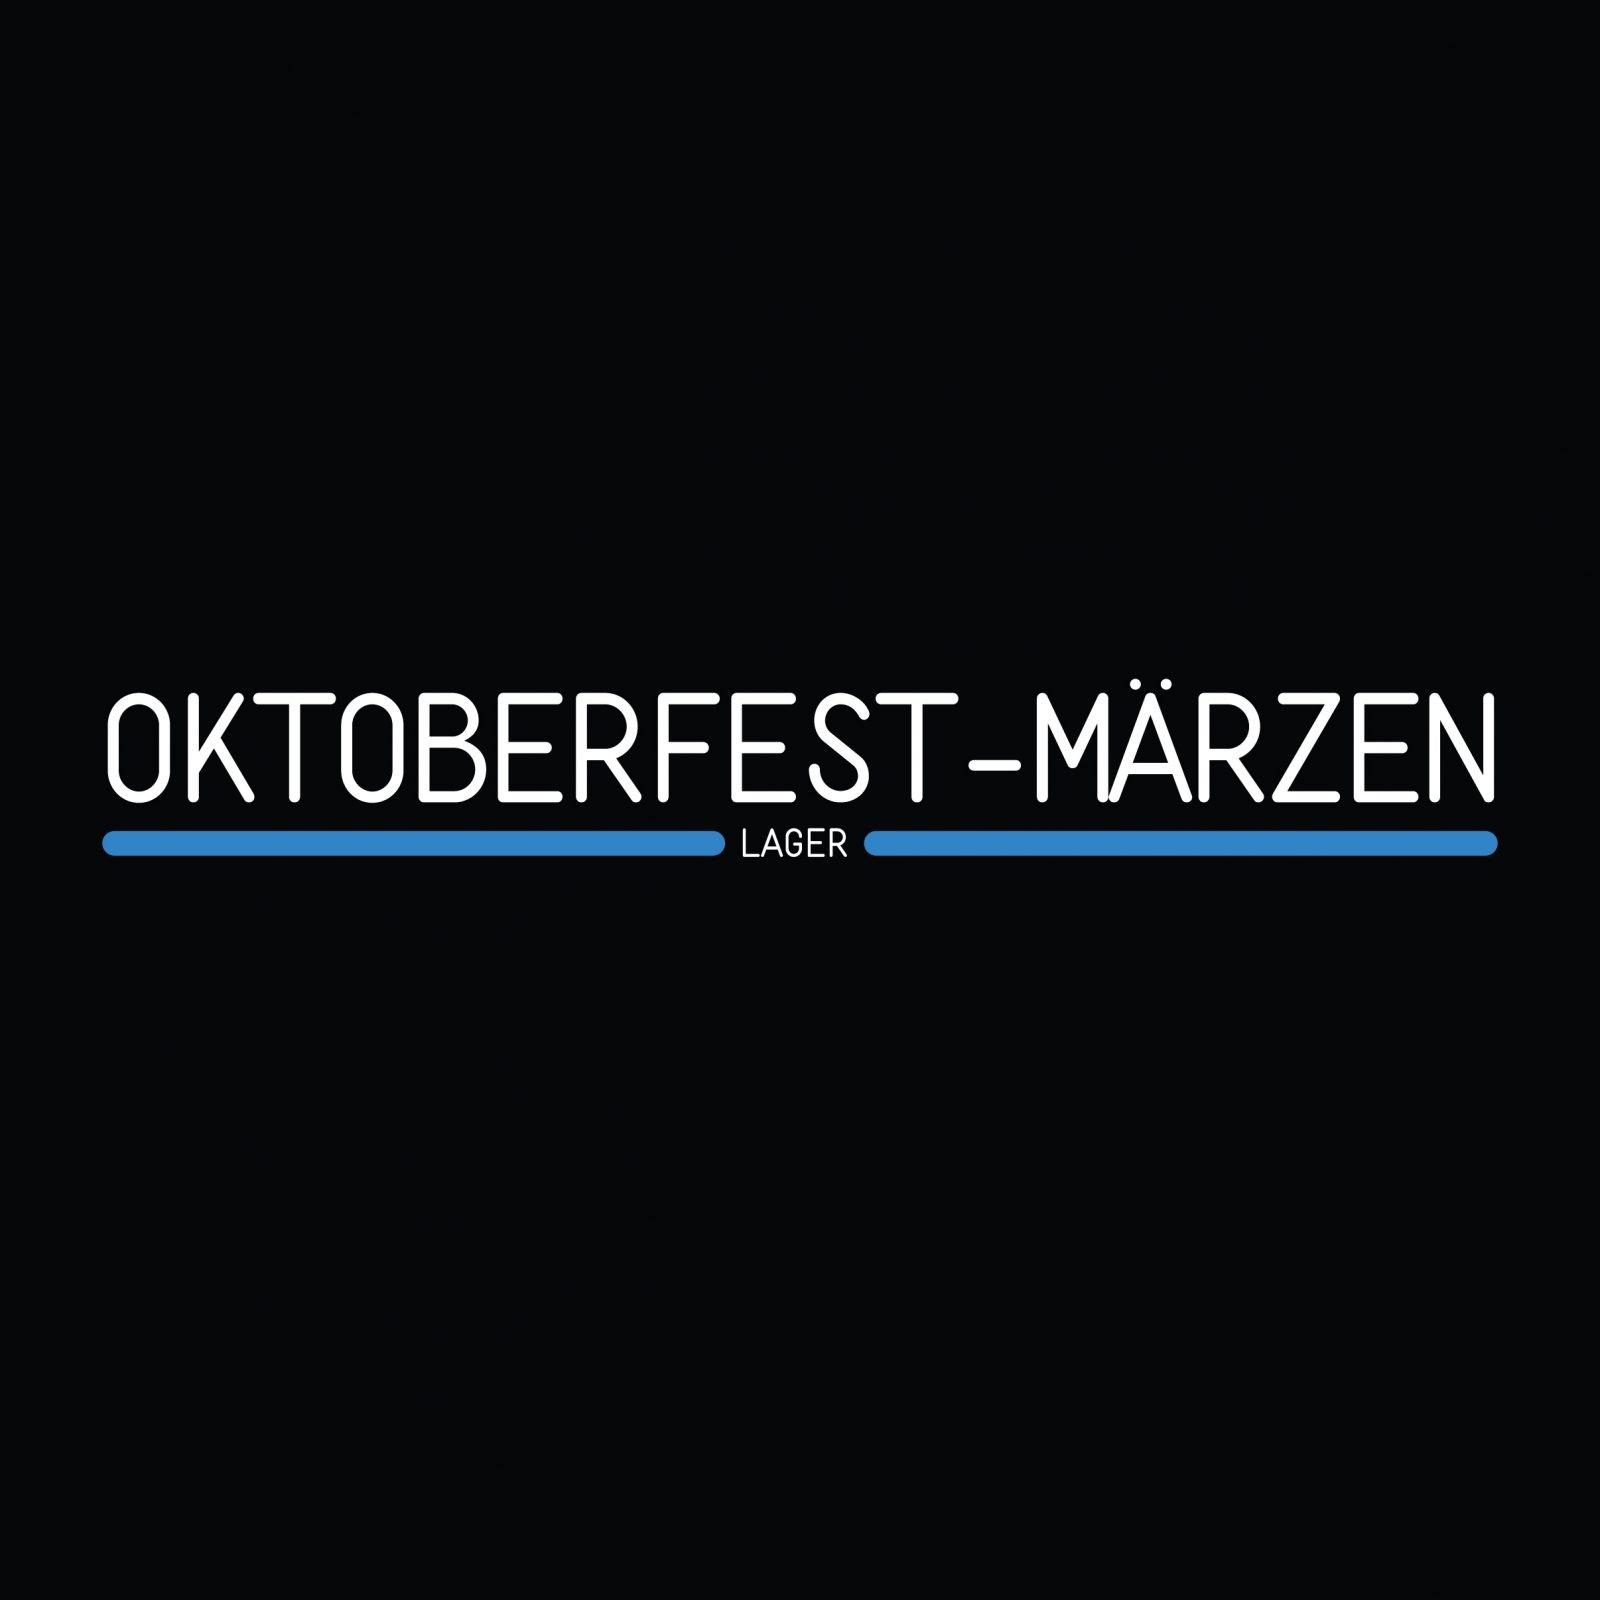 Oktoberfest-Märzen